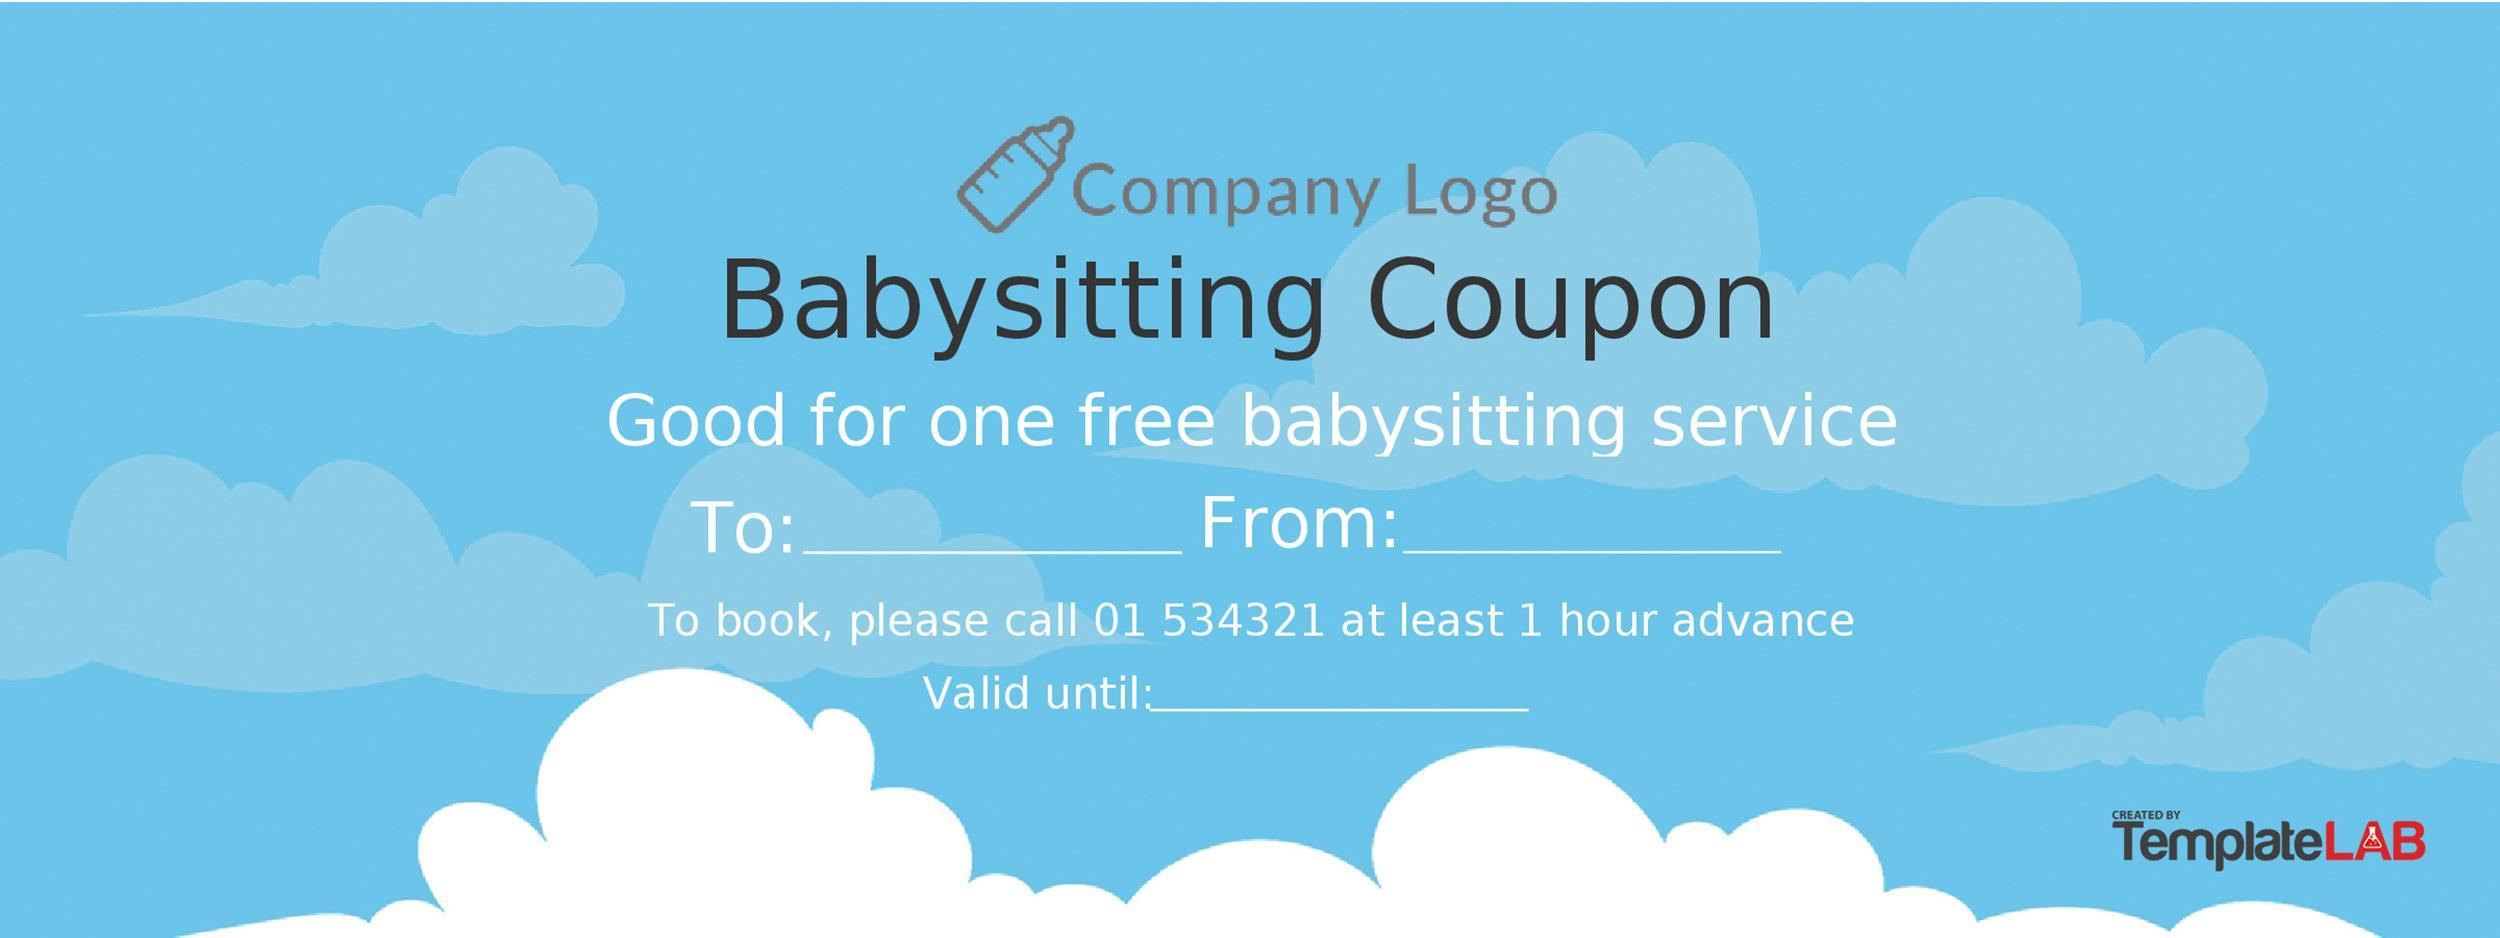 Free Babysitting Coupon 1  – TemplateLab